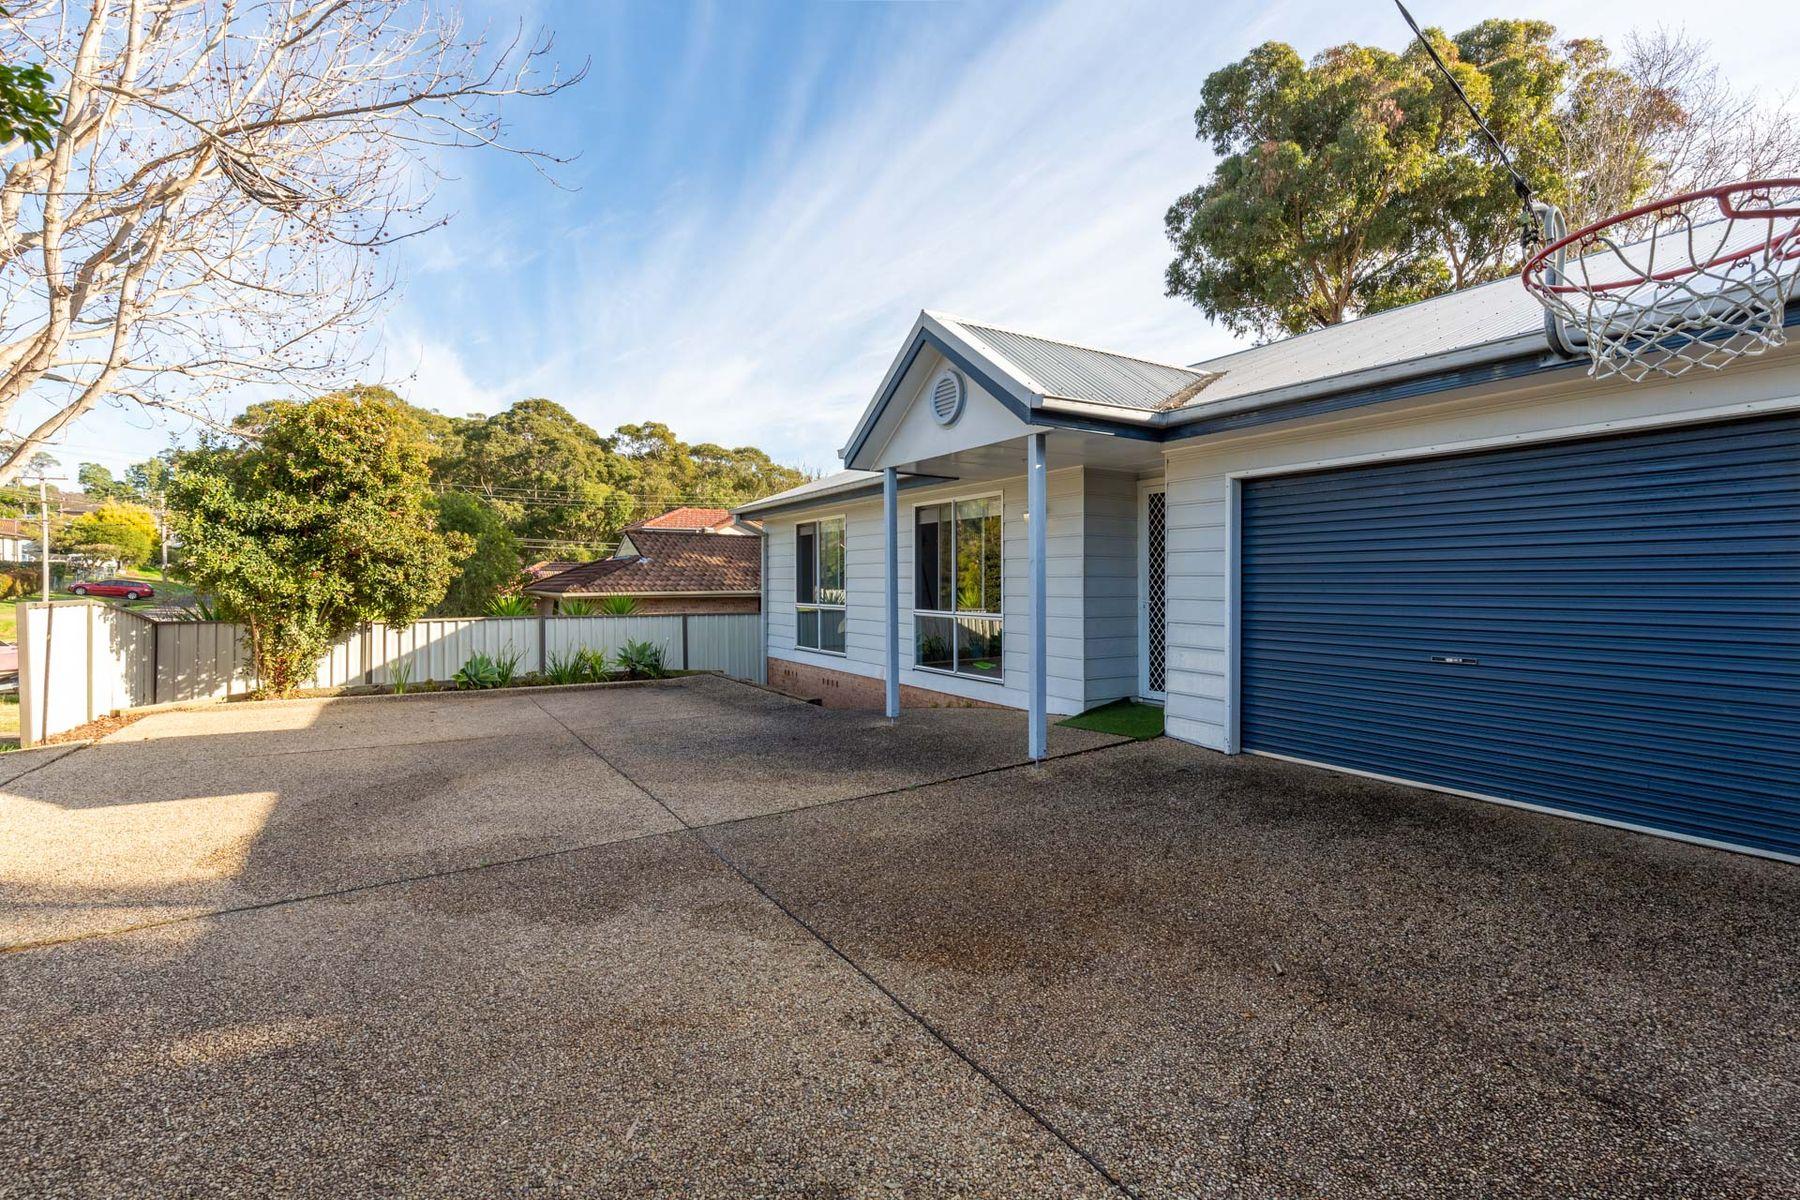 11 Macquarie Street, Arcadia Vale, NSW 2283